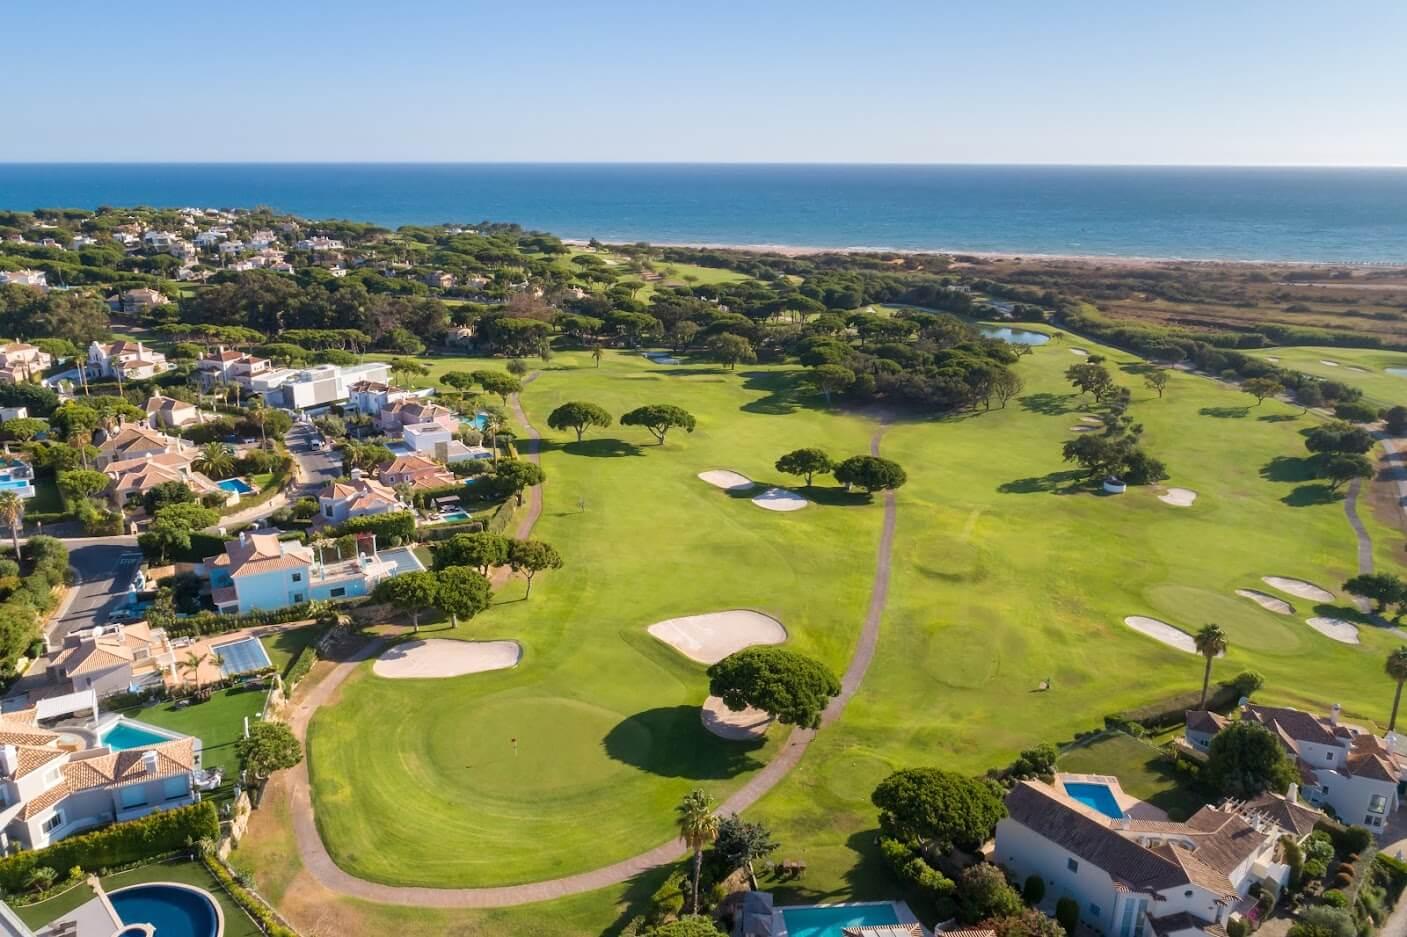 Best Golf Resorts in Spain